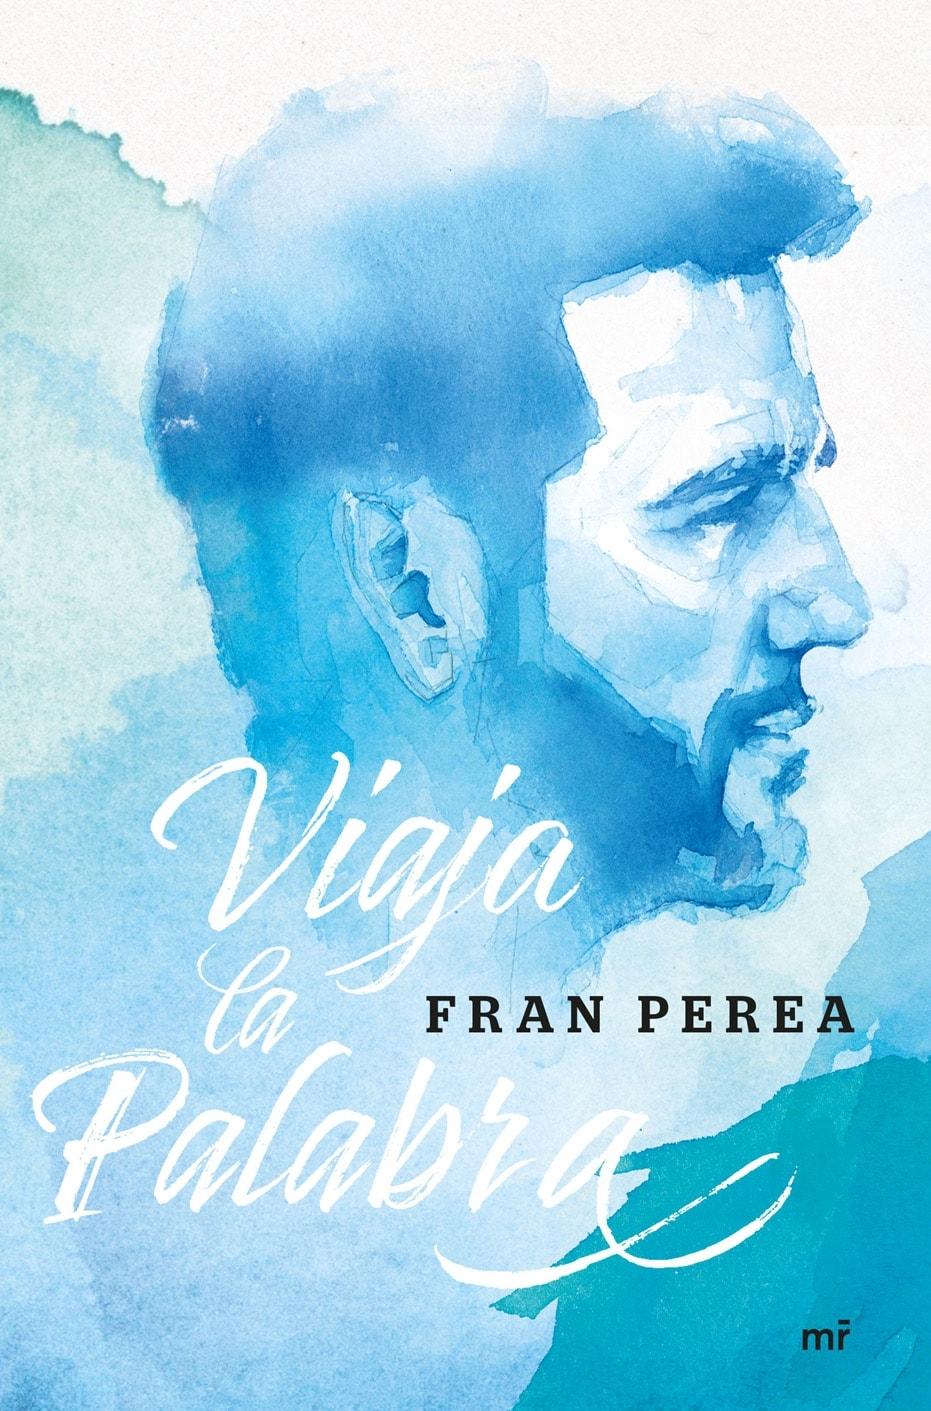 Fran Perea presenta Viaja la Palabra